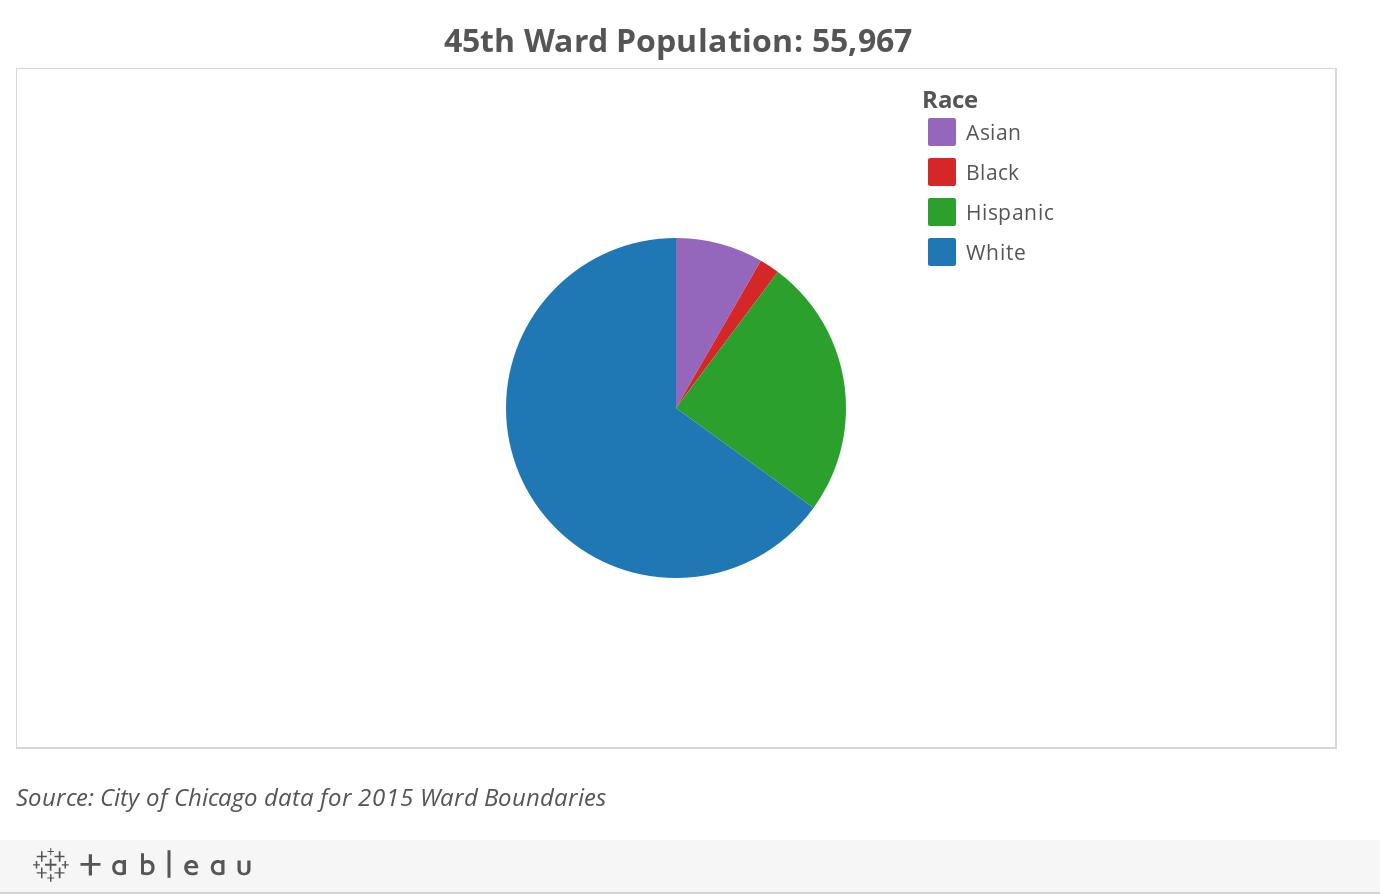 45th Ward Demographics